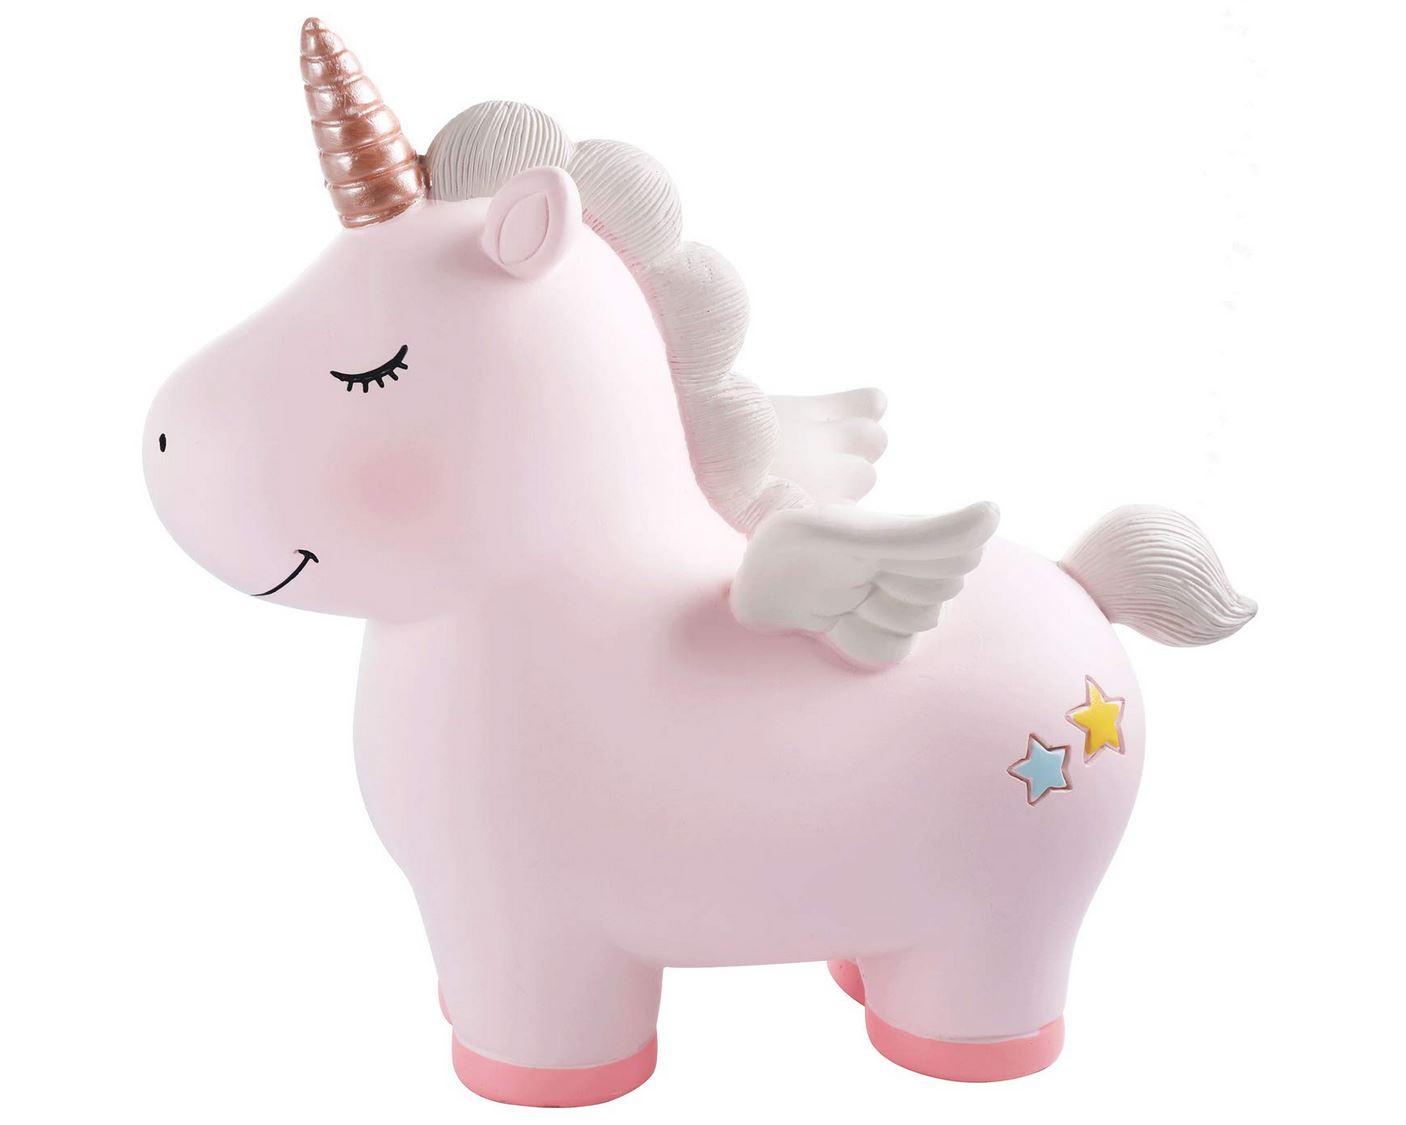 https://i2.wp.com/media.boingboing.net/wp-content/uploads/2020/03/piggy-unicorn.jpg?w=1406&ssl=1